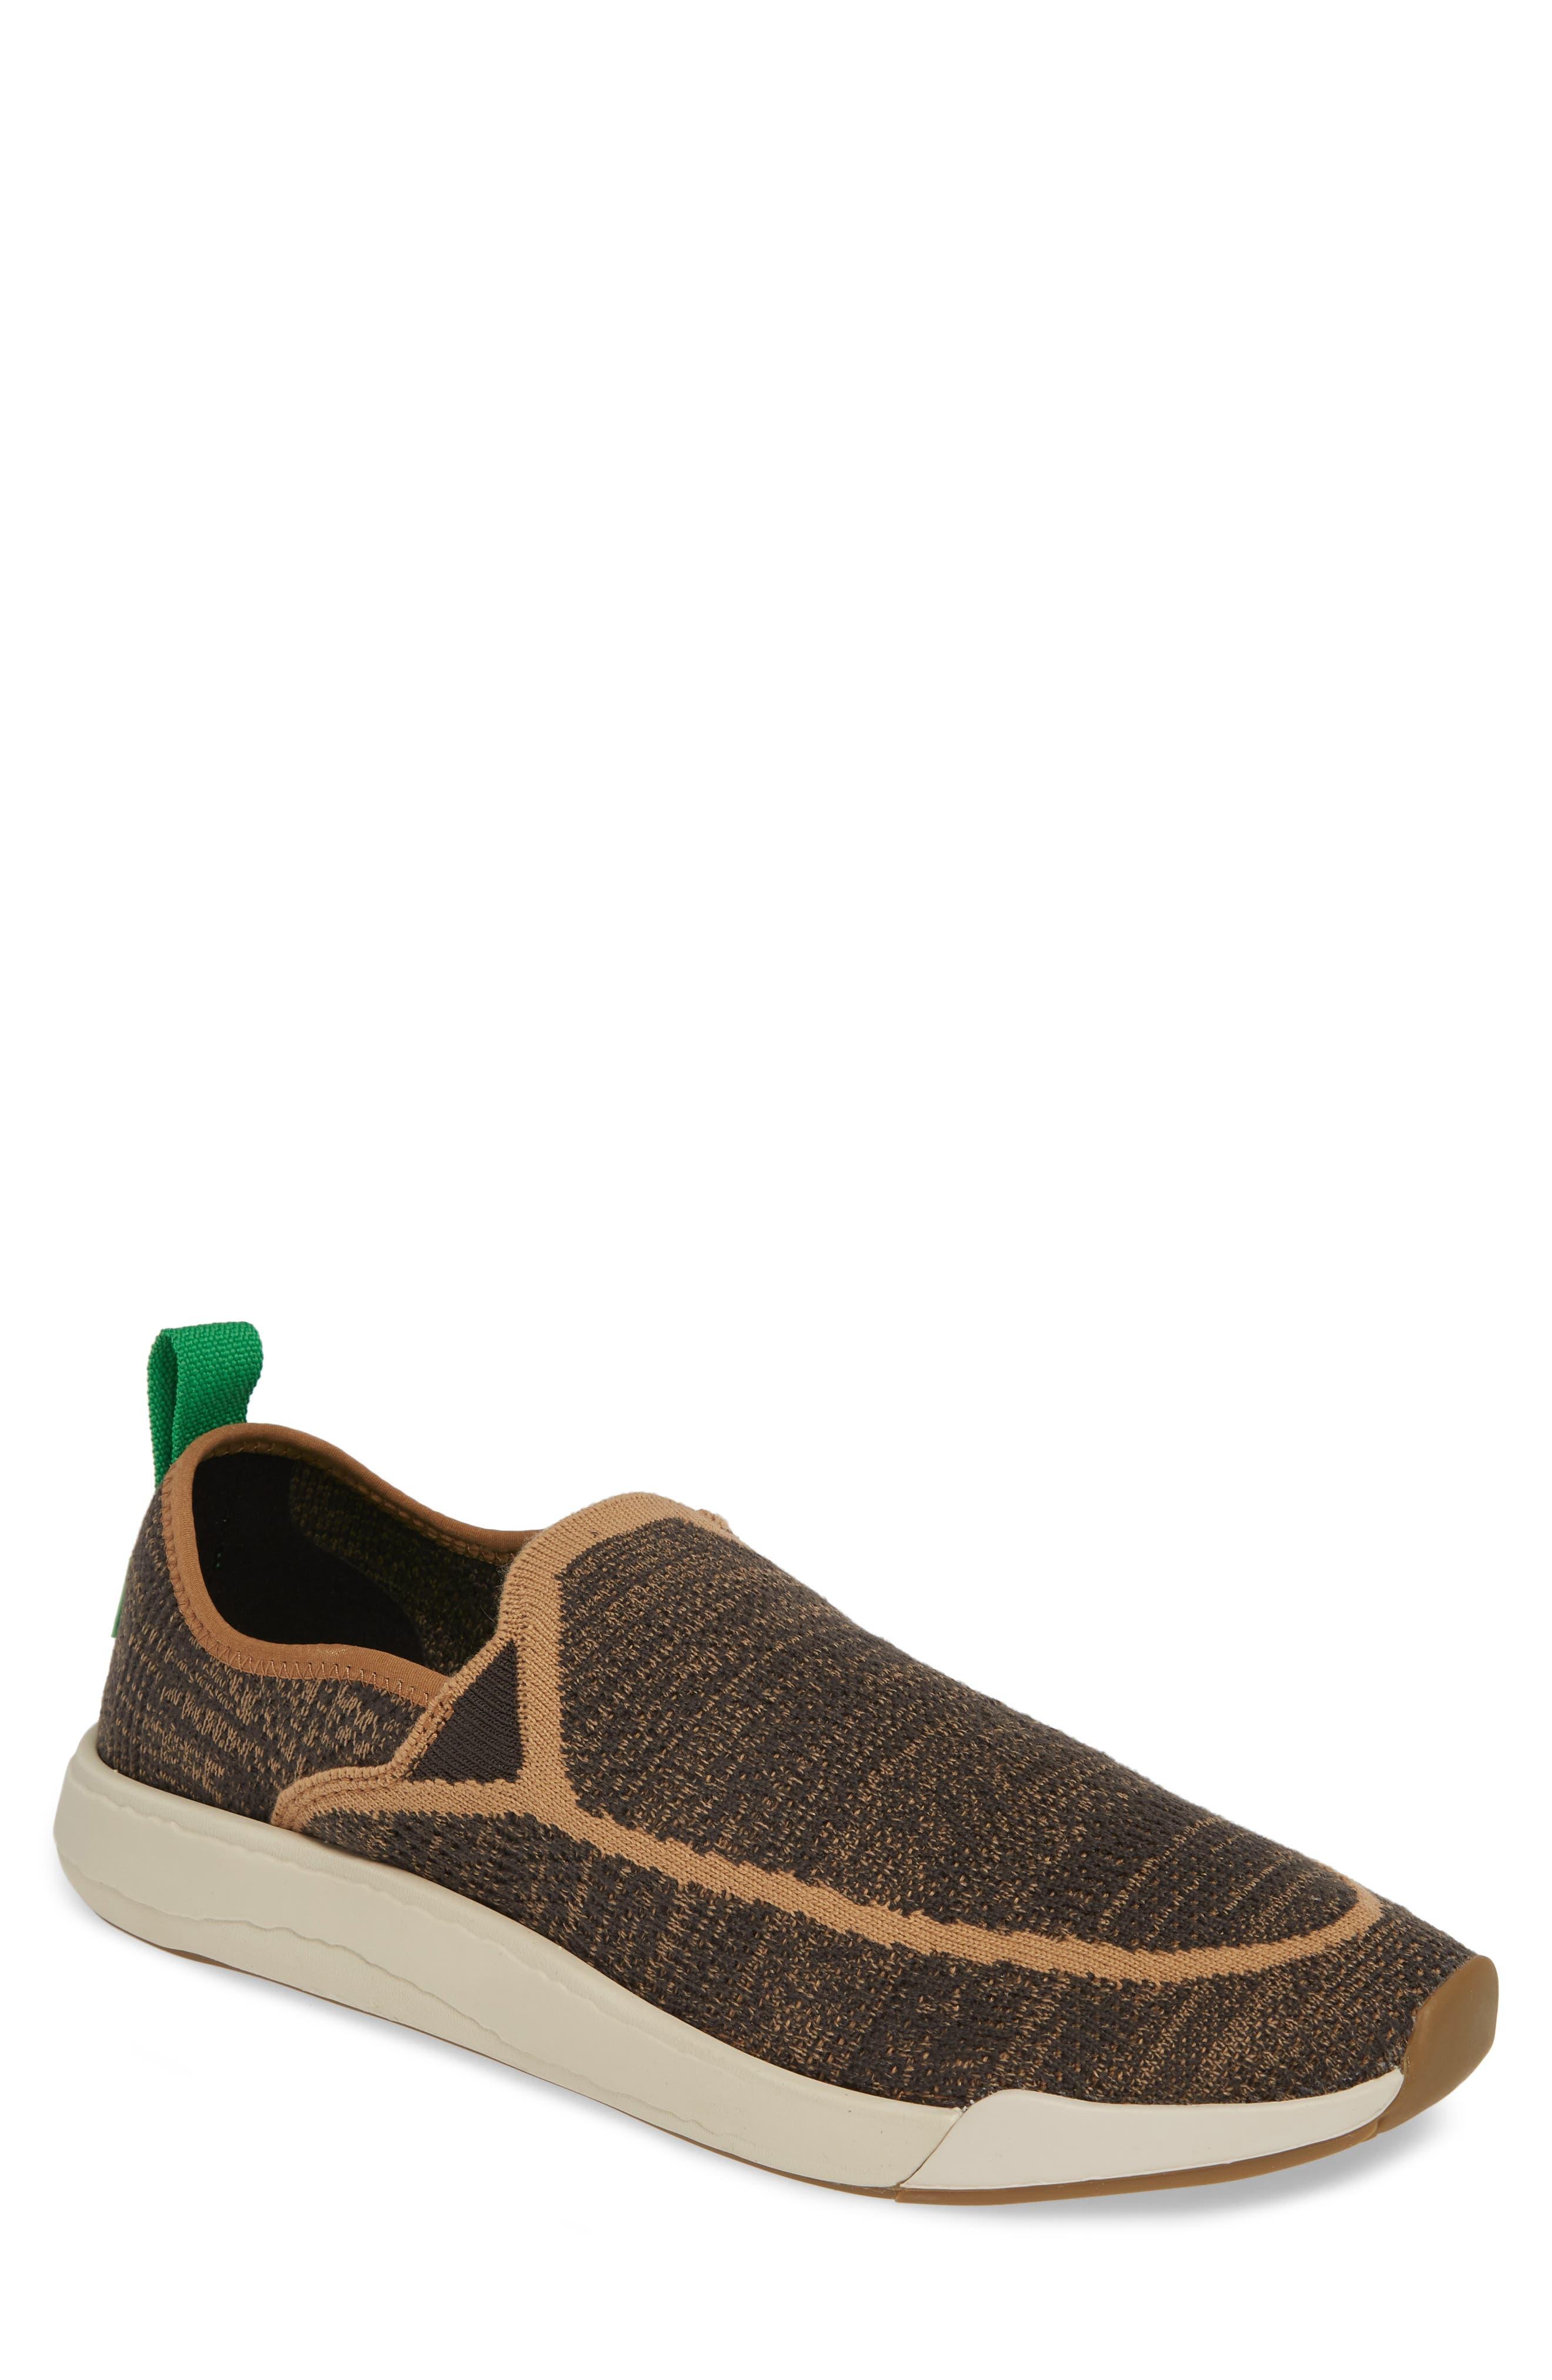 Sanuk Chiba Quest Knit Slip-On Sneaker, Brown